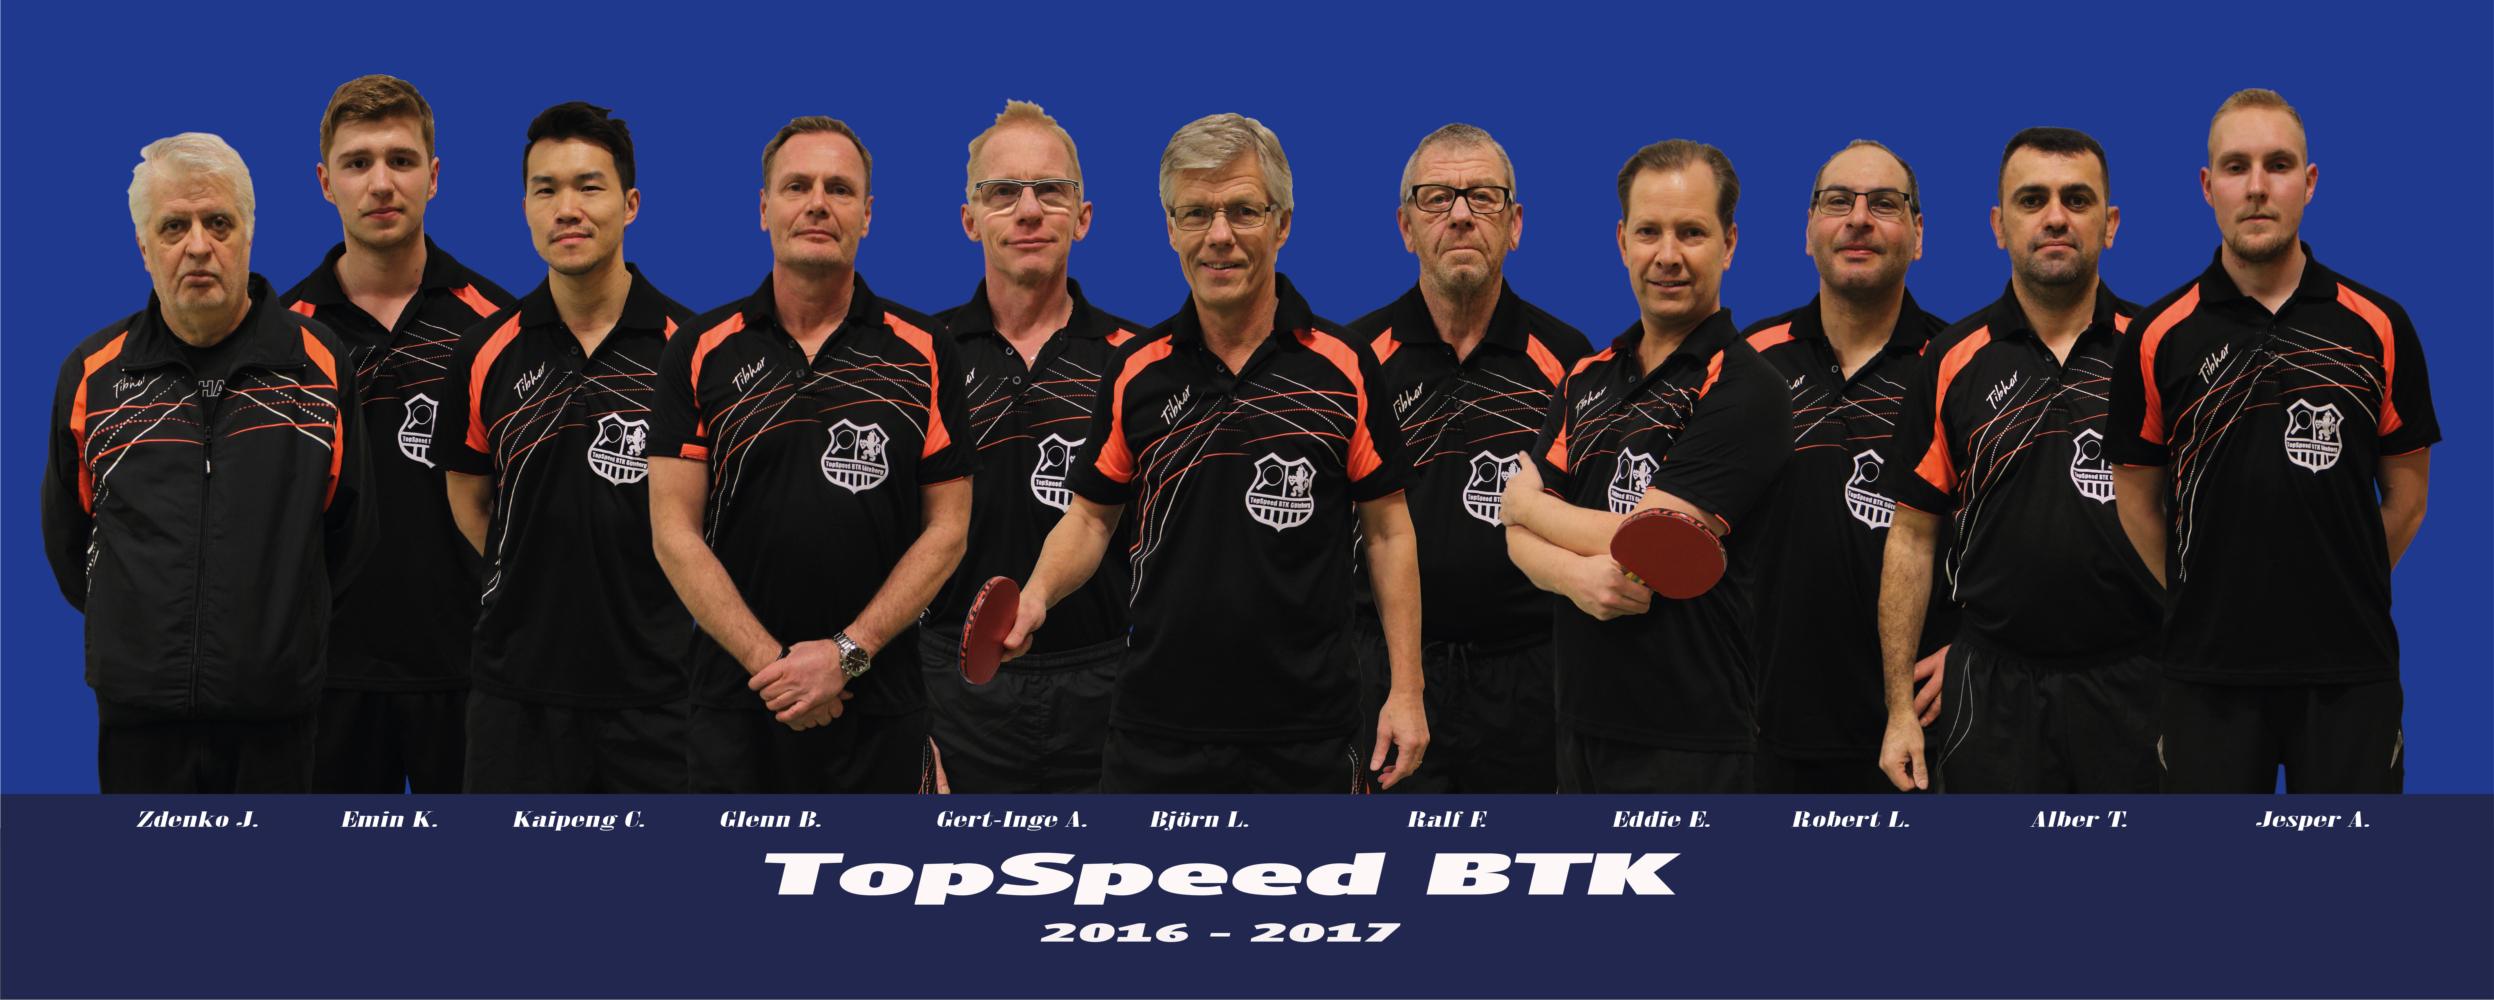 TopSpeed BTK - LAG - 2016-2017